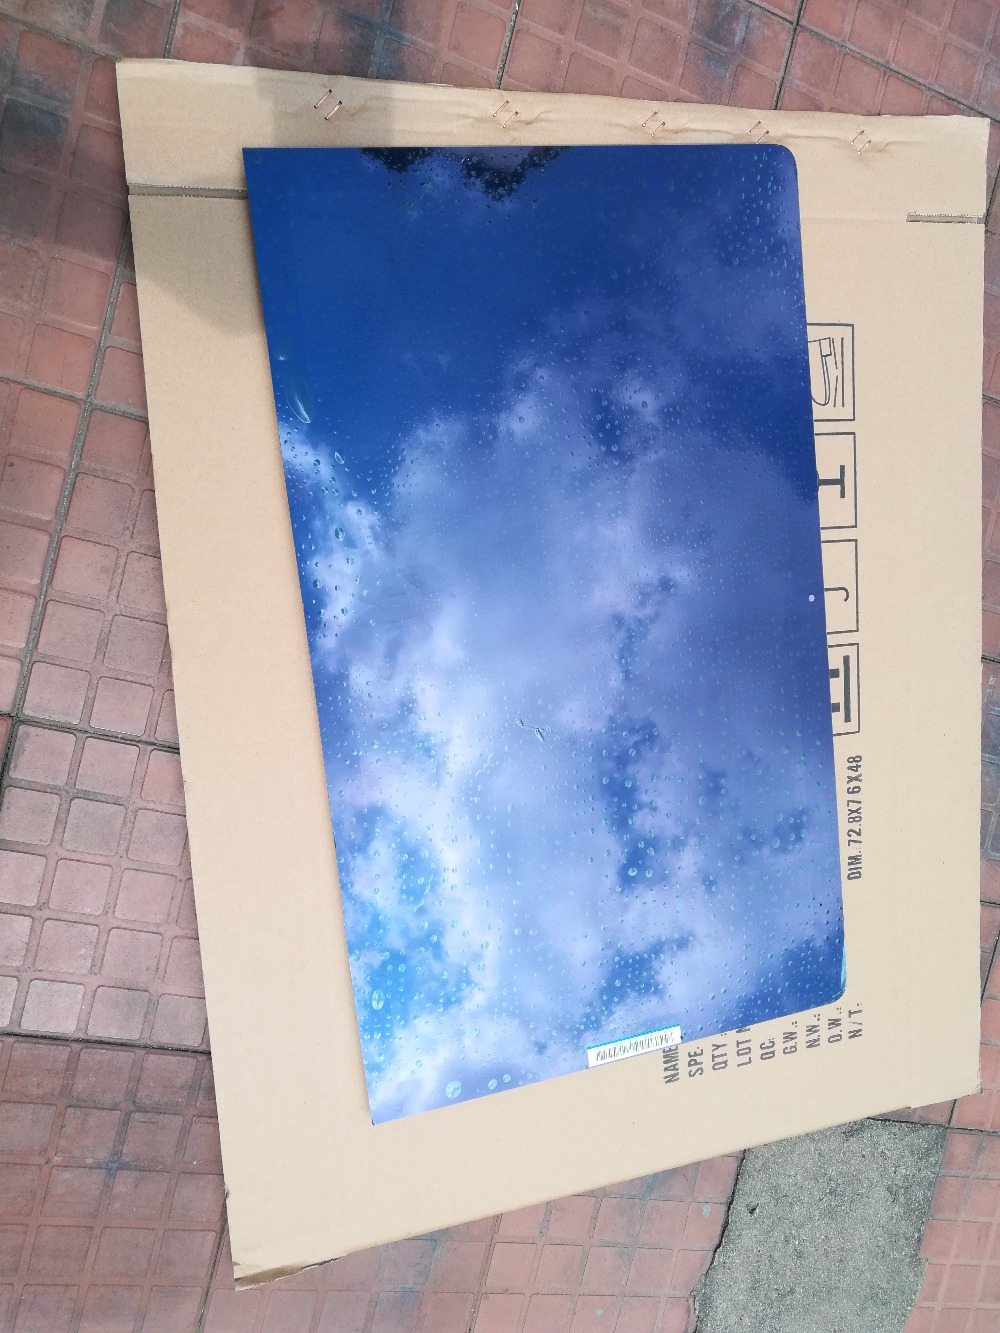 "Tout nouveau iMac Retina 27 ""5 K fin 2015 IPS LCD écran d'affichage LM270QQ1 SD B1 SDB1 A1419 5120x2880 EMC2806 661-03255"